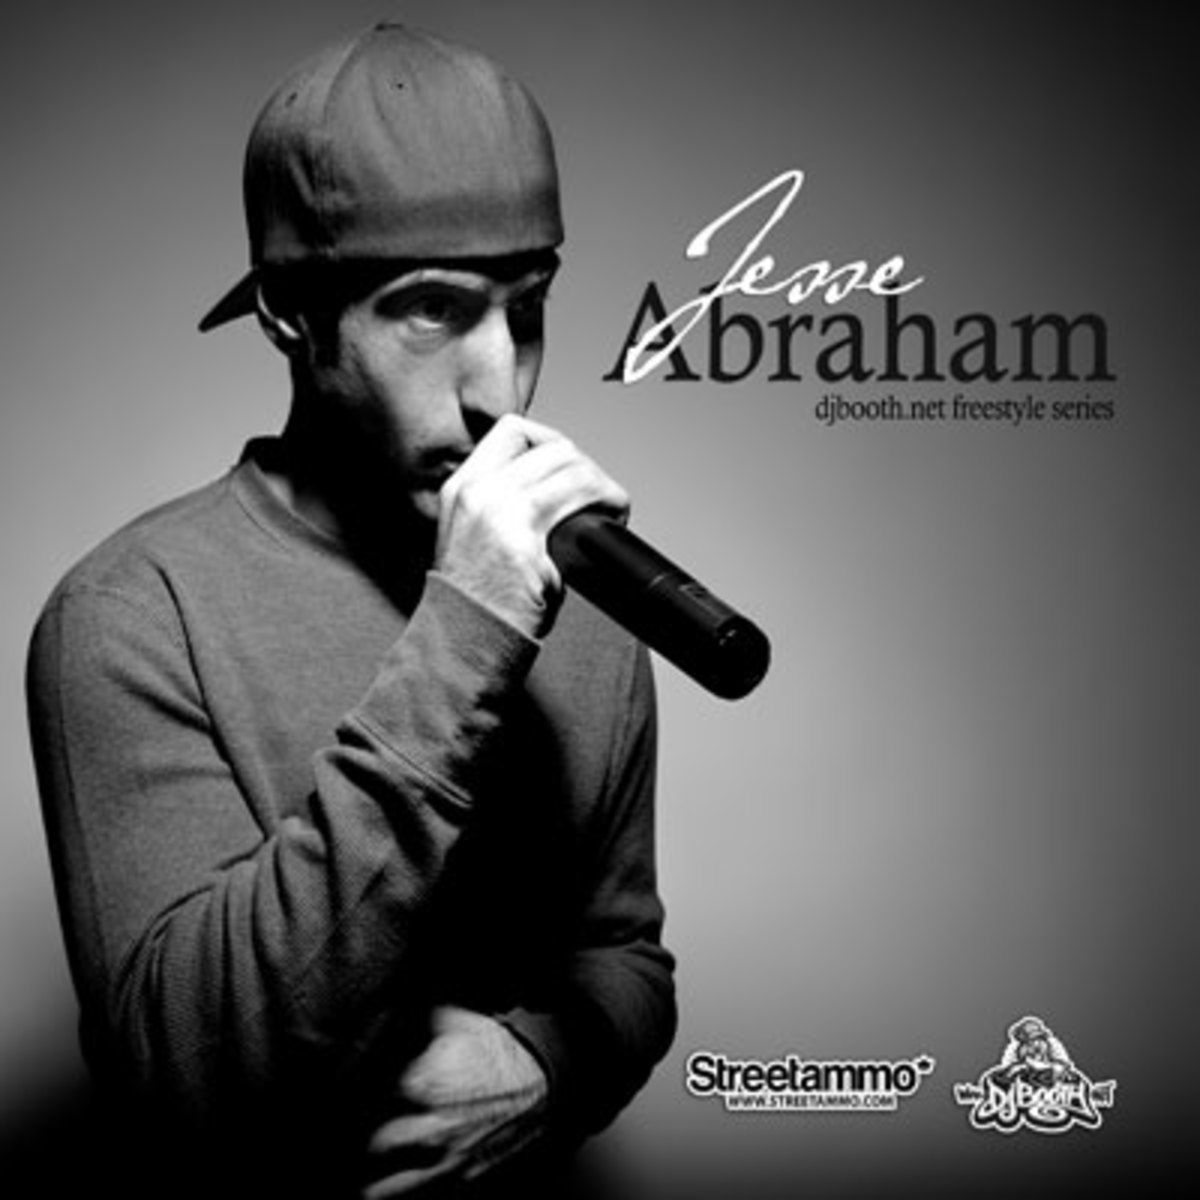 jesseabraham-free.jpg